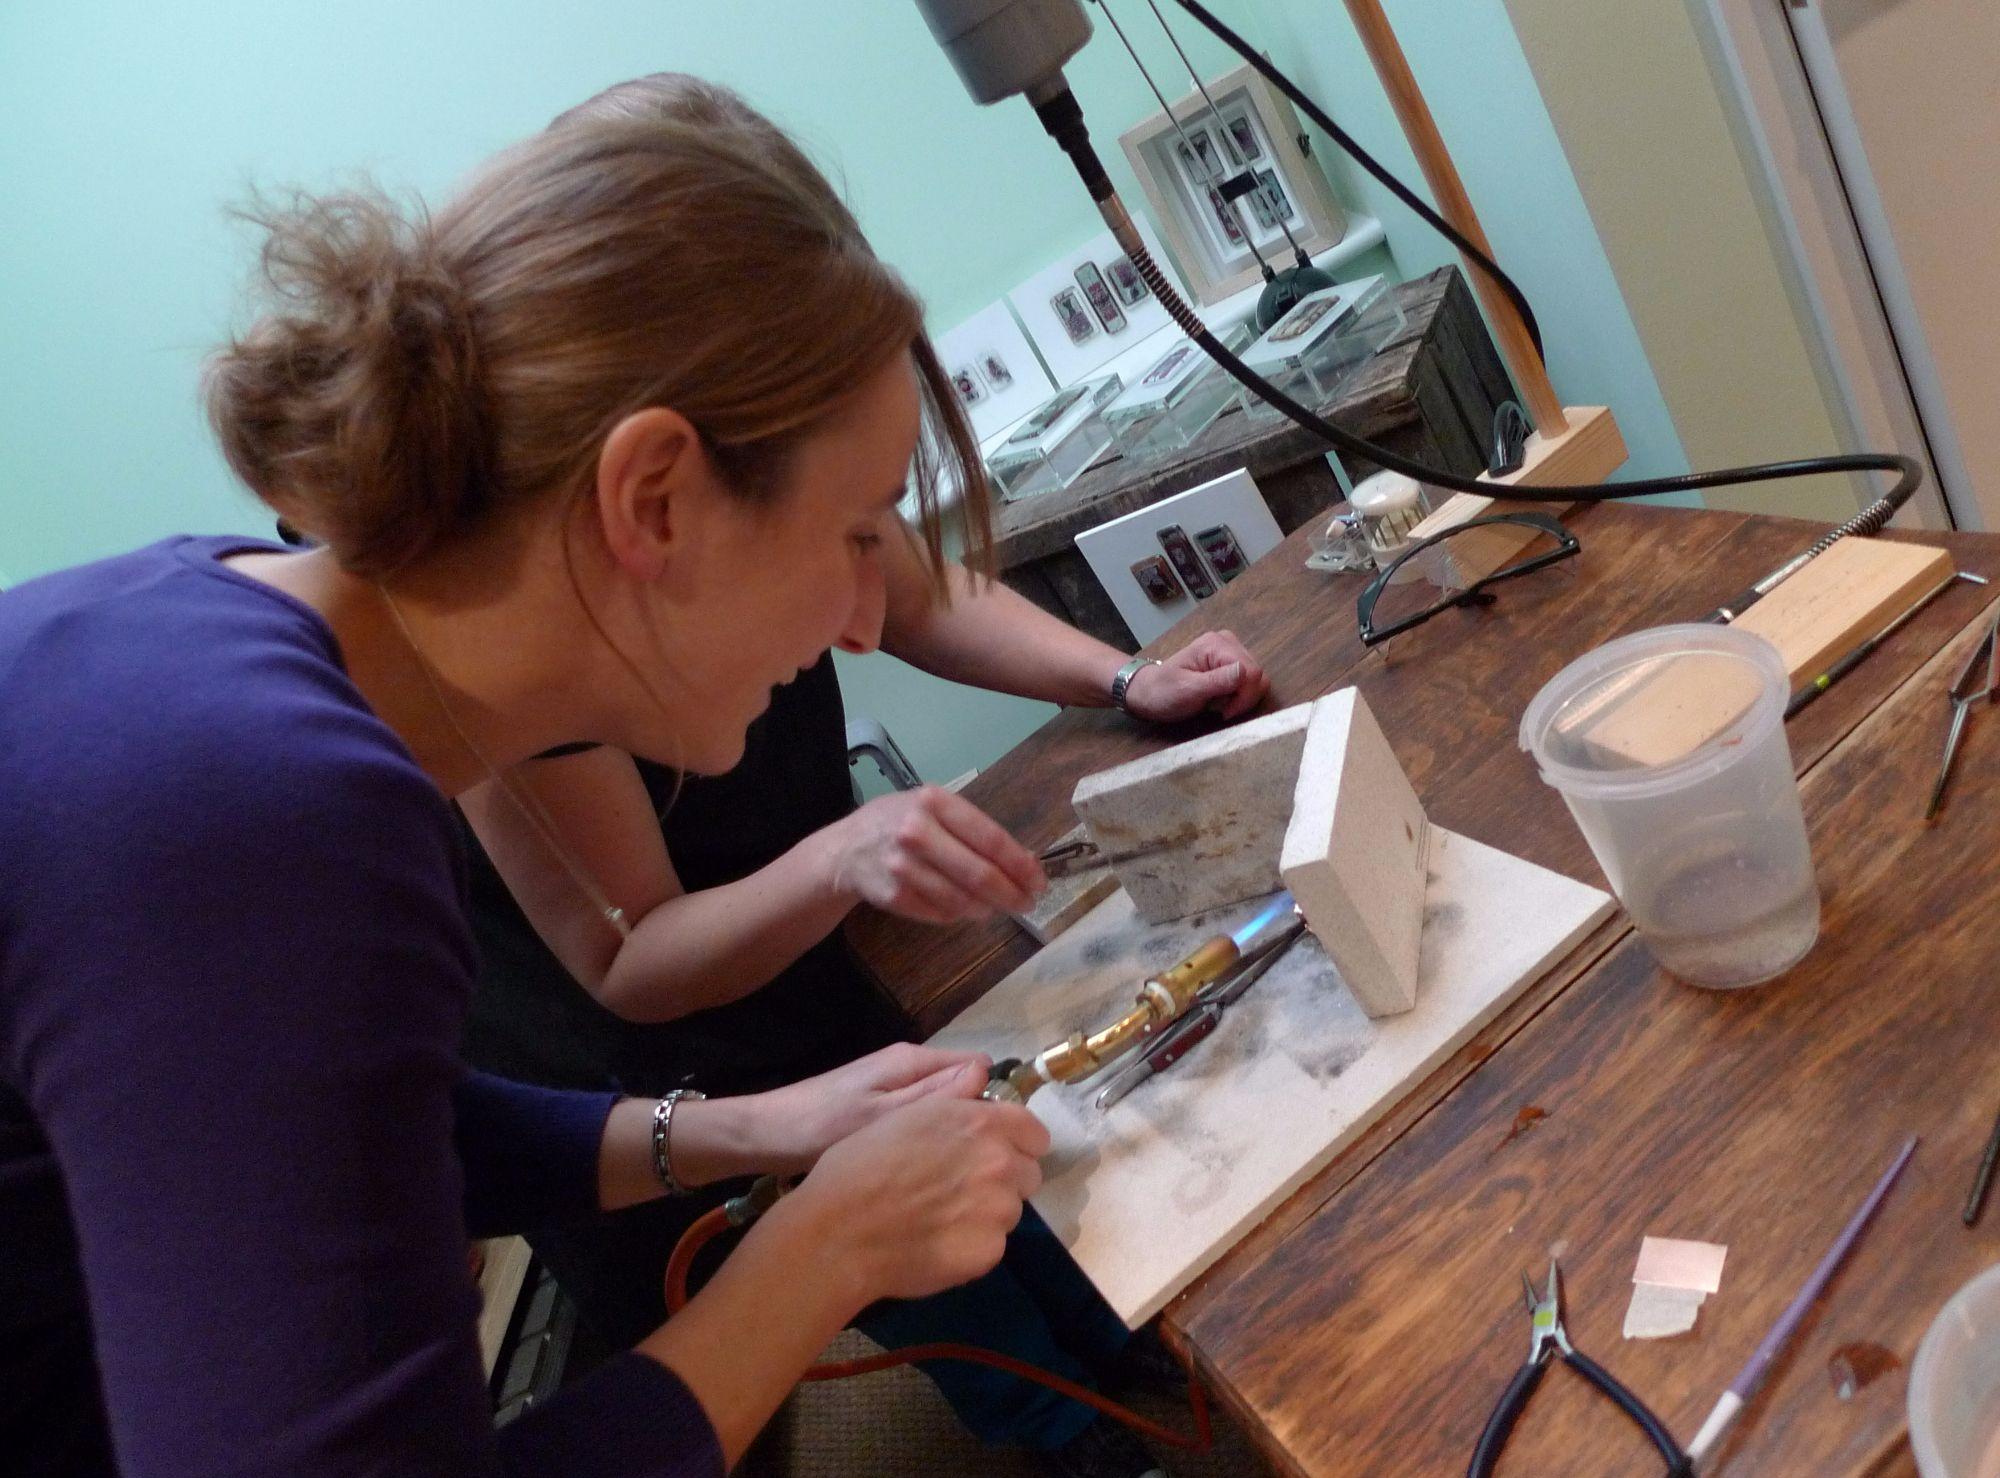 Silver Ring Workshop - Making